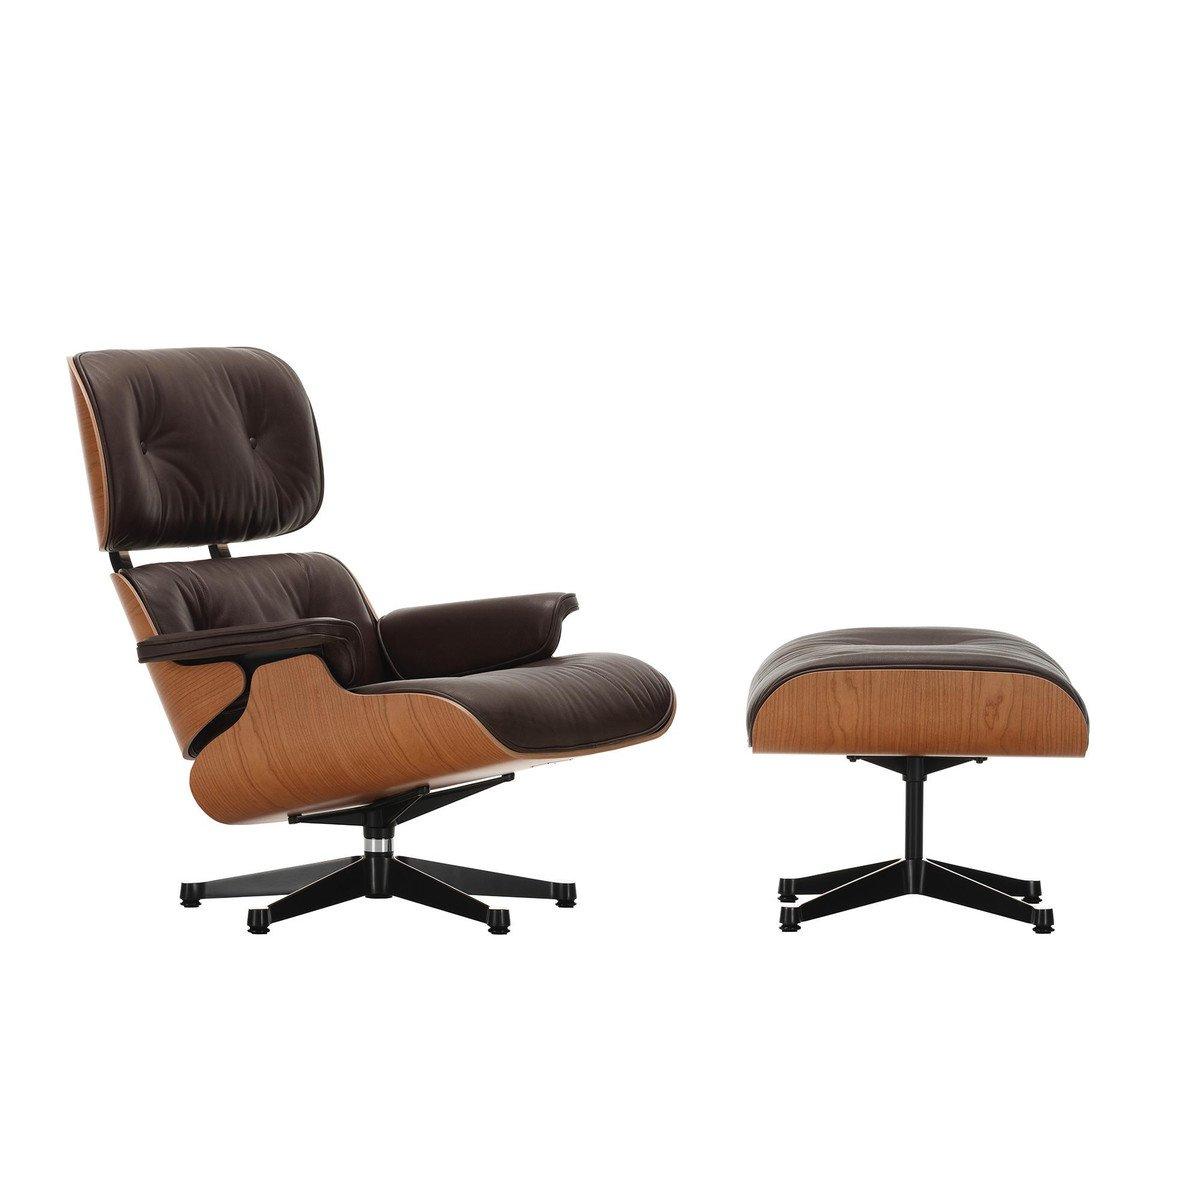 Eames Vitra Lounge Chair eames lounge chair ottoman vitra ambientedirect com